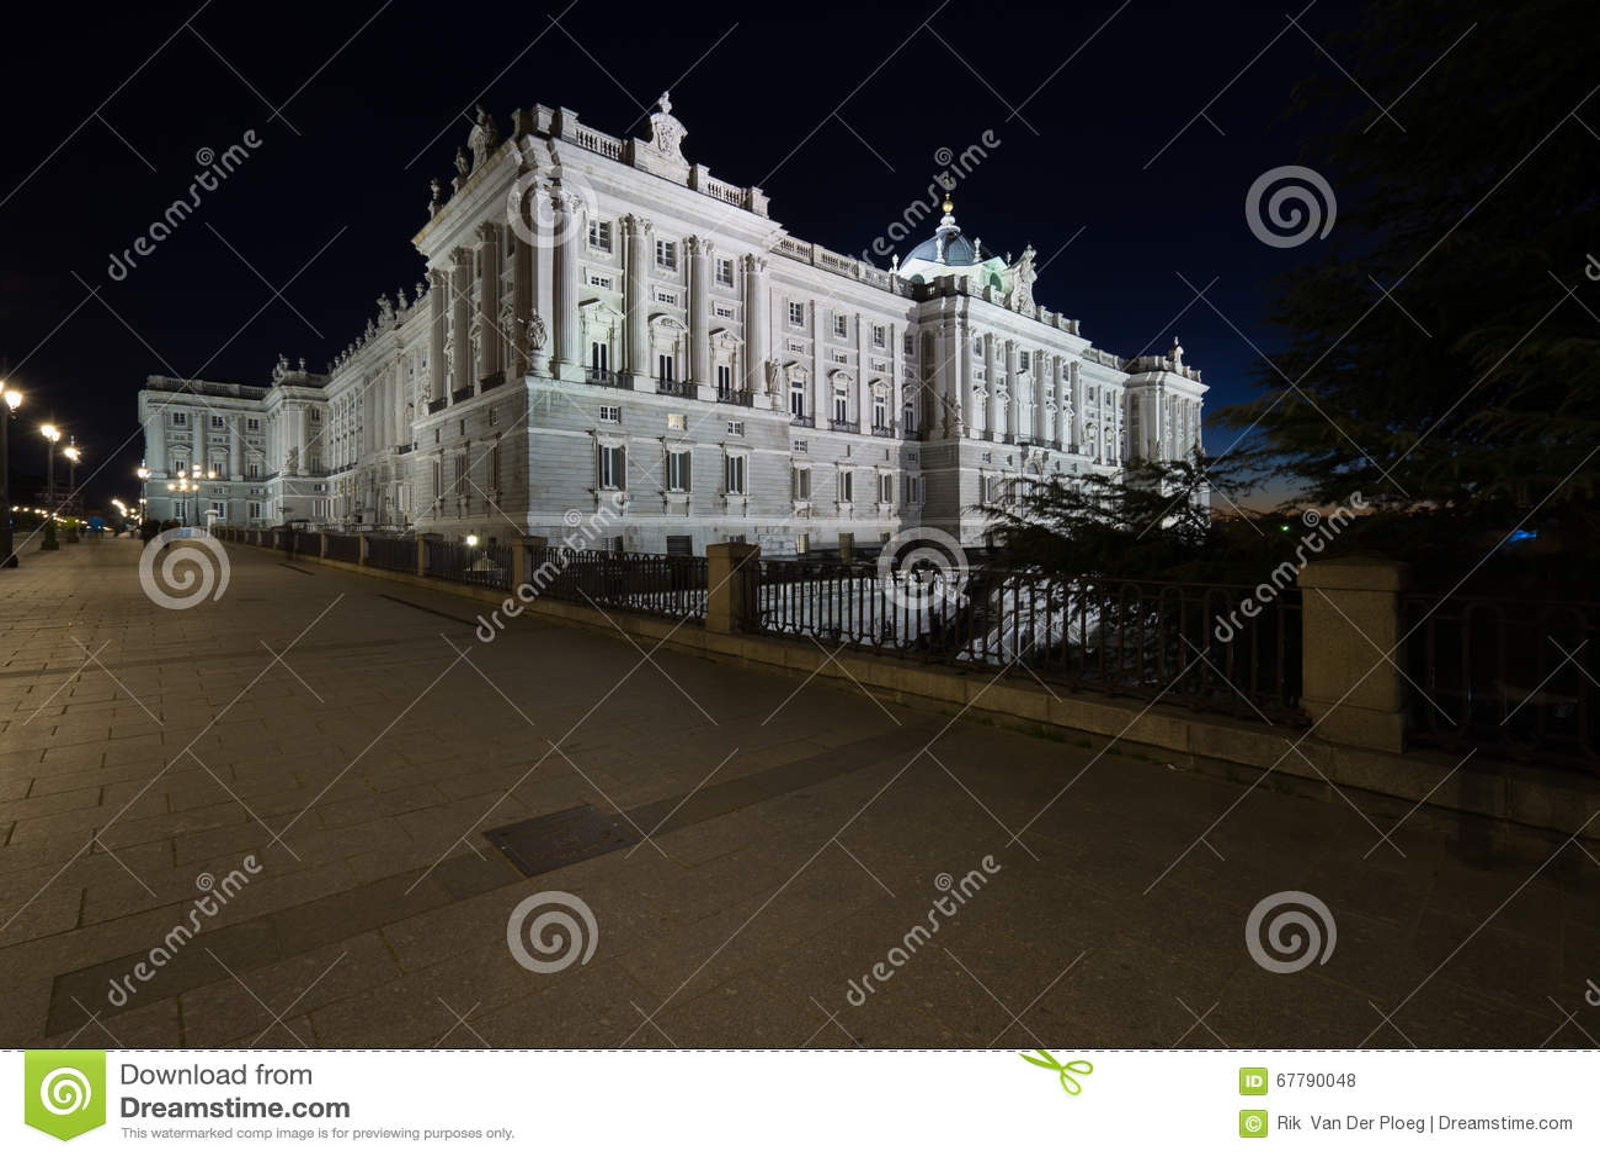 View of Palacio Real by night